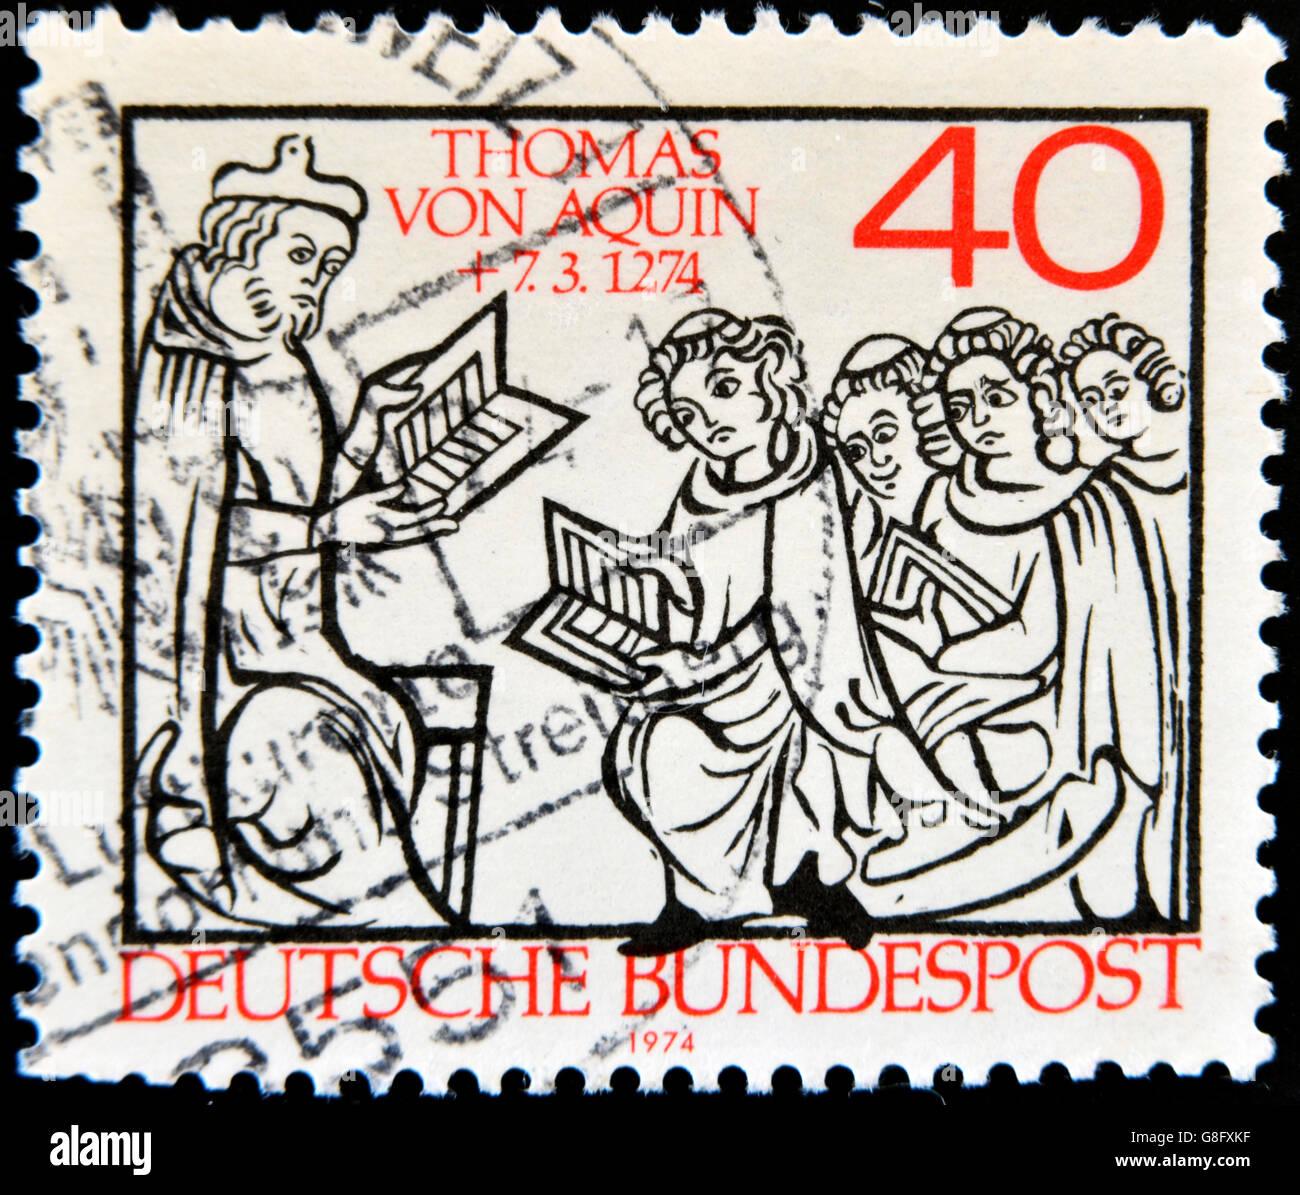 GERMANY - CIRCA 1974: A stamp printed in Germany shows Thomas Aquinas, circa 1974 - Stock Image